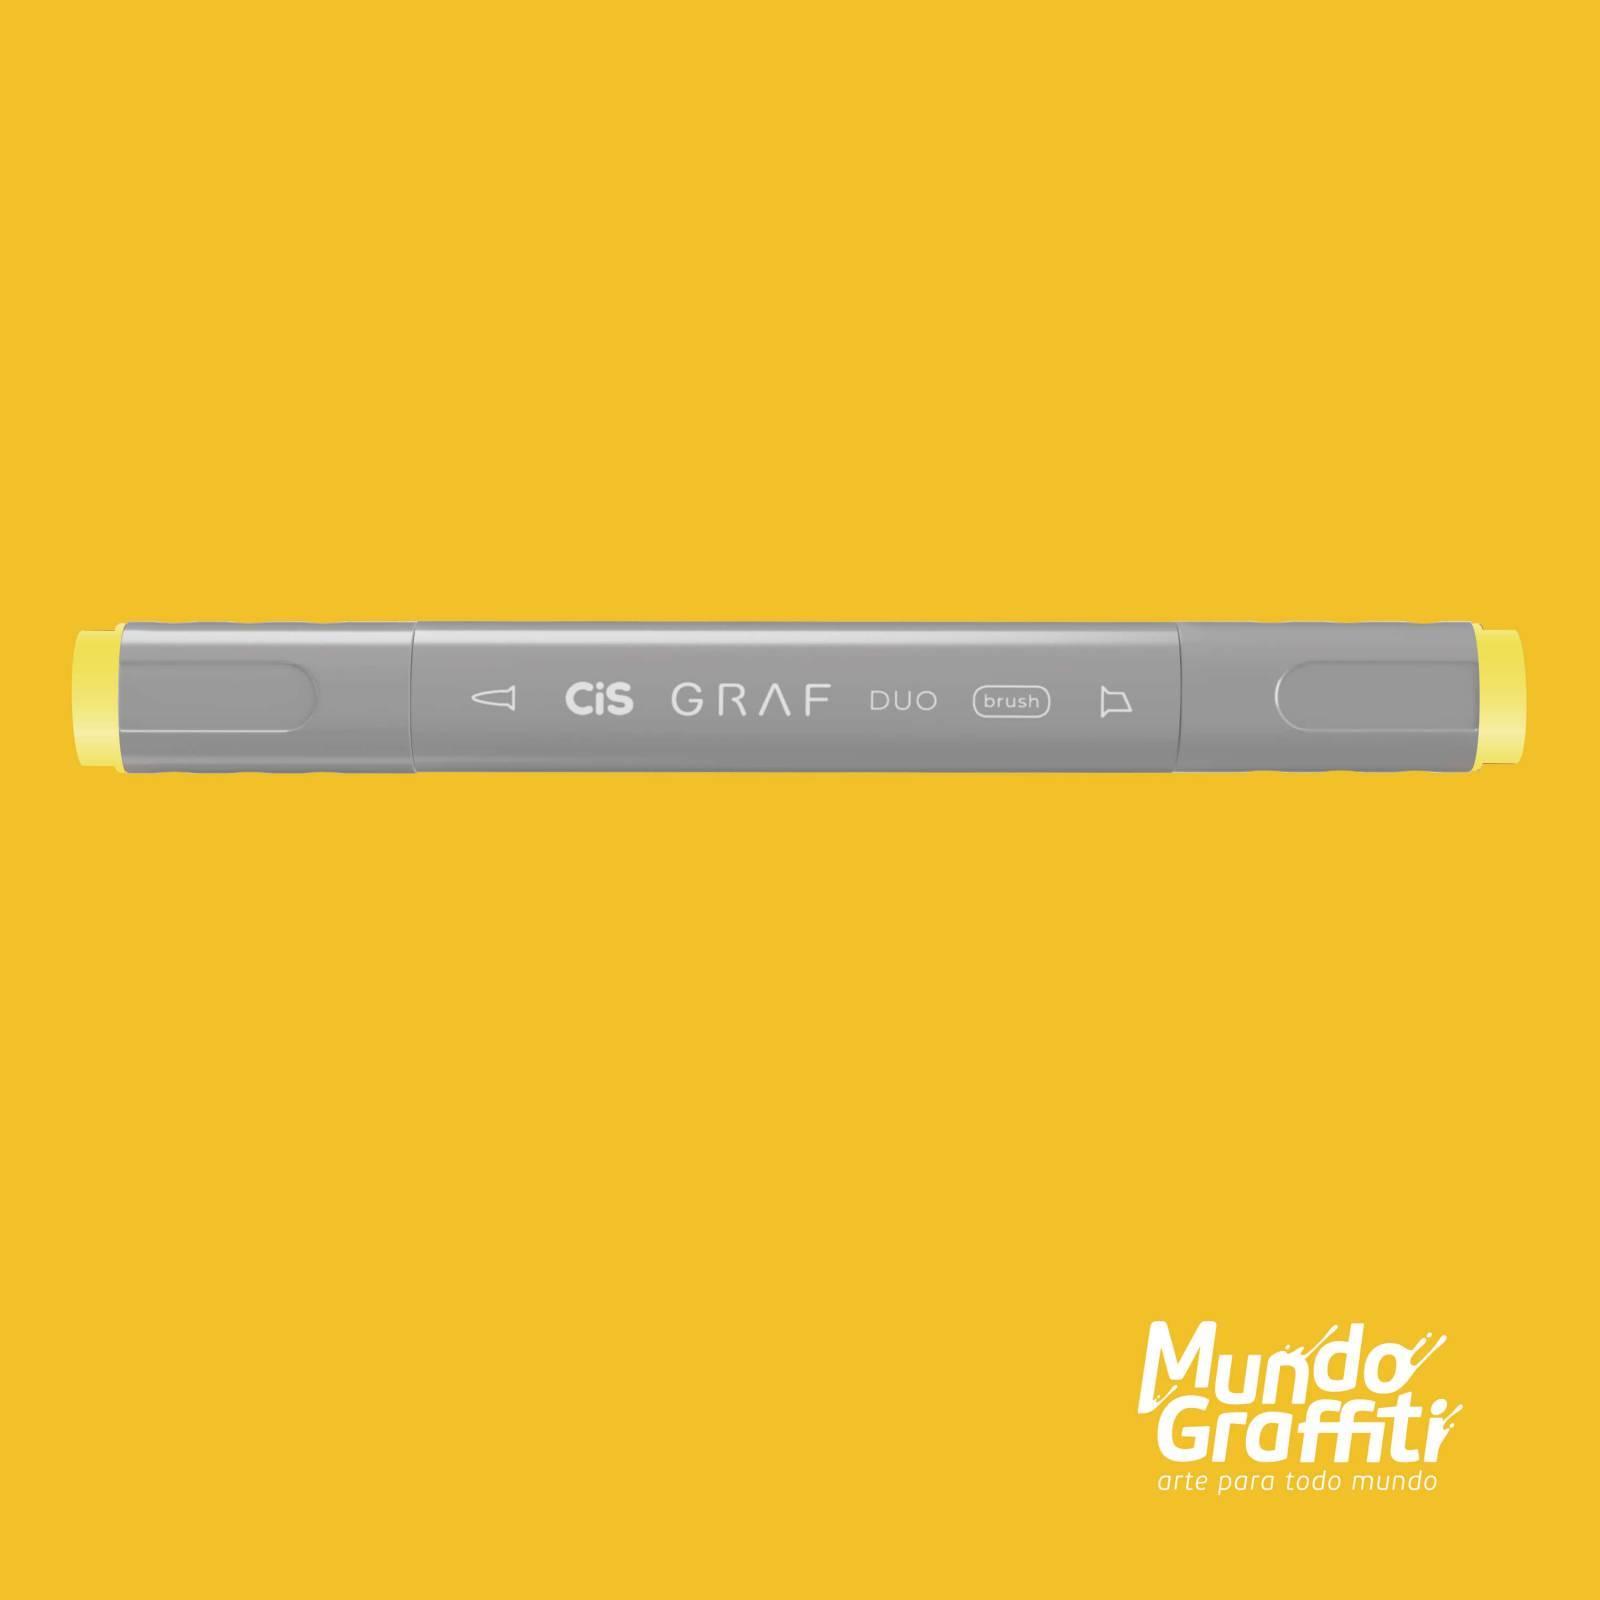 Marcador Cis Graf Duo Brush Melon Yellow 33 - Mundo Graffiti